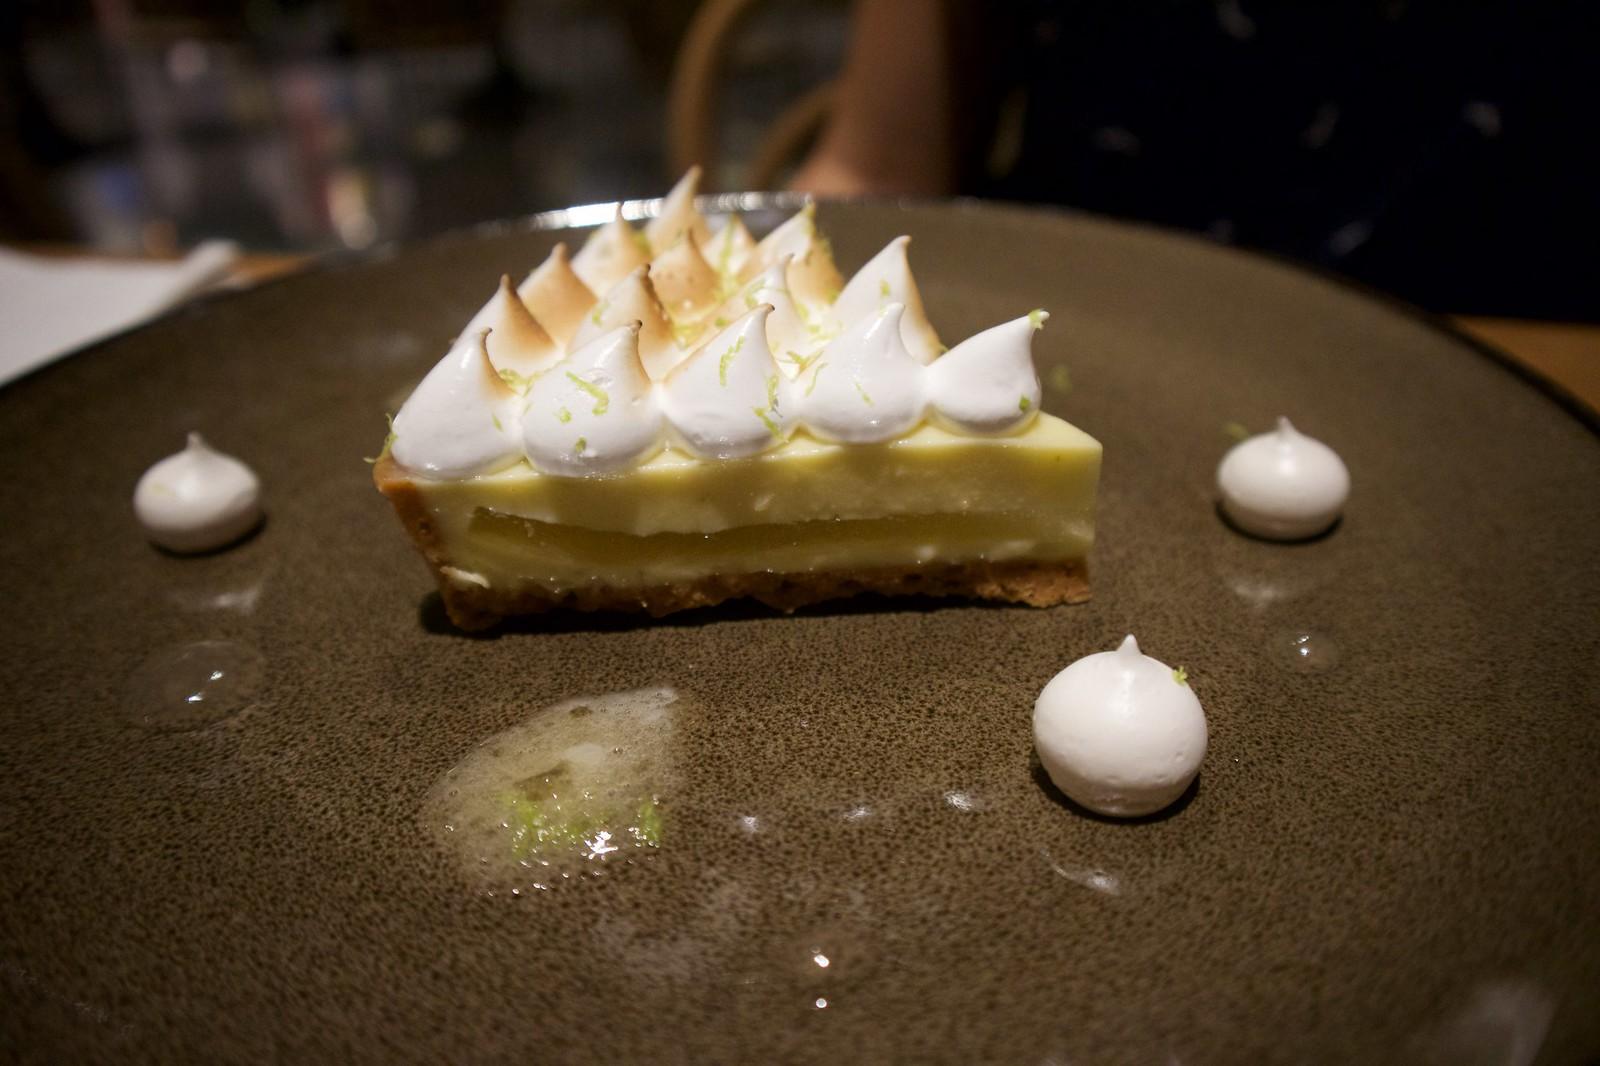 Lemon merengue pie